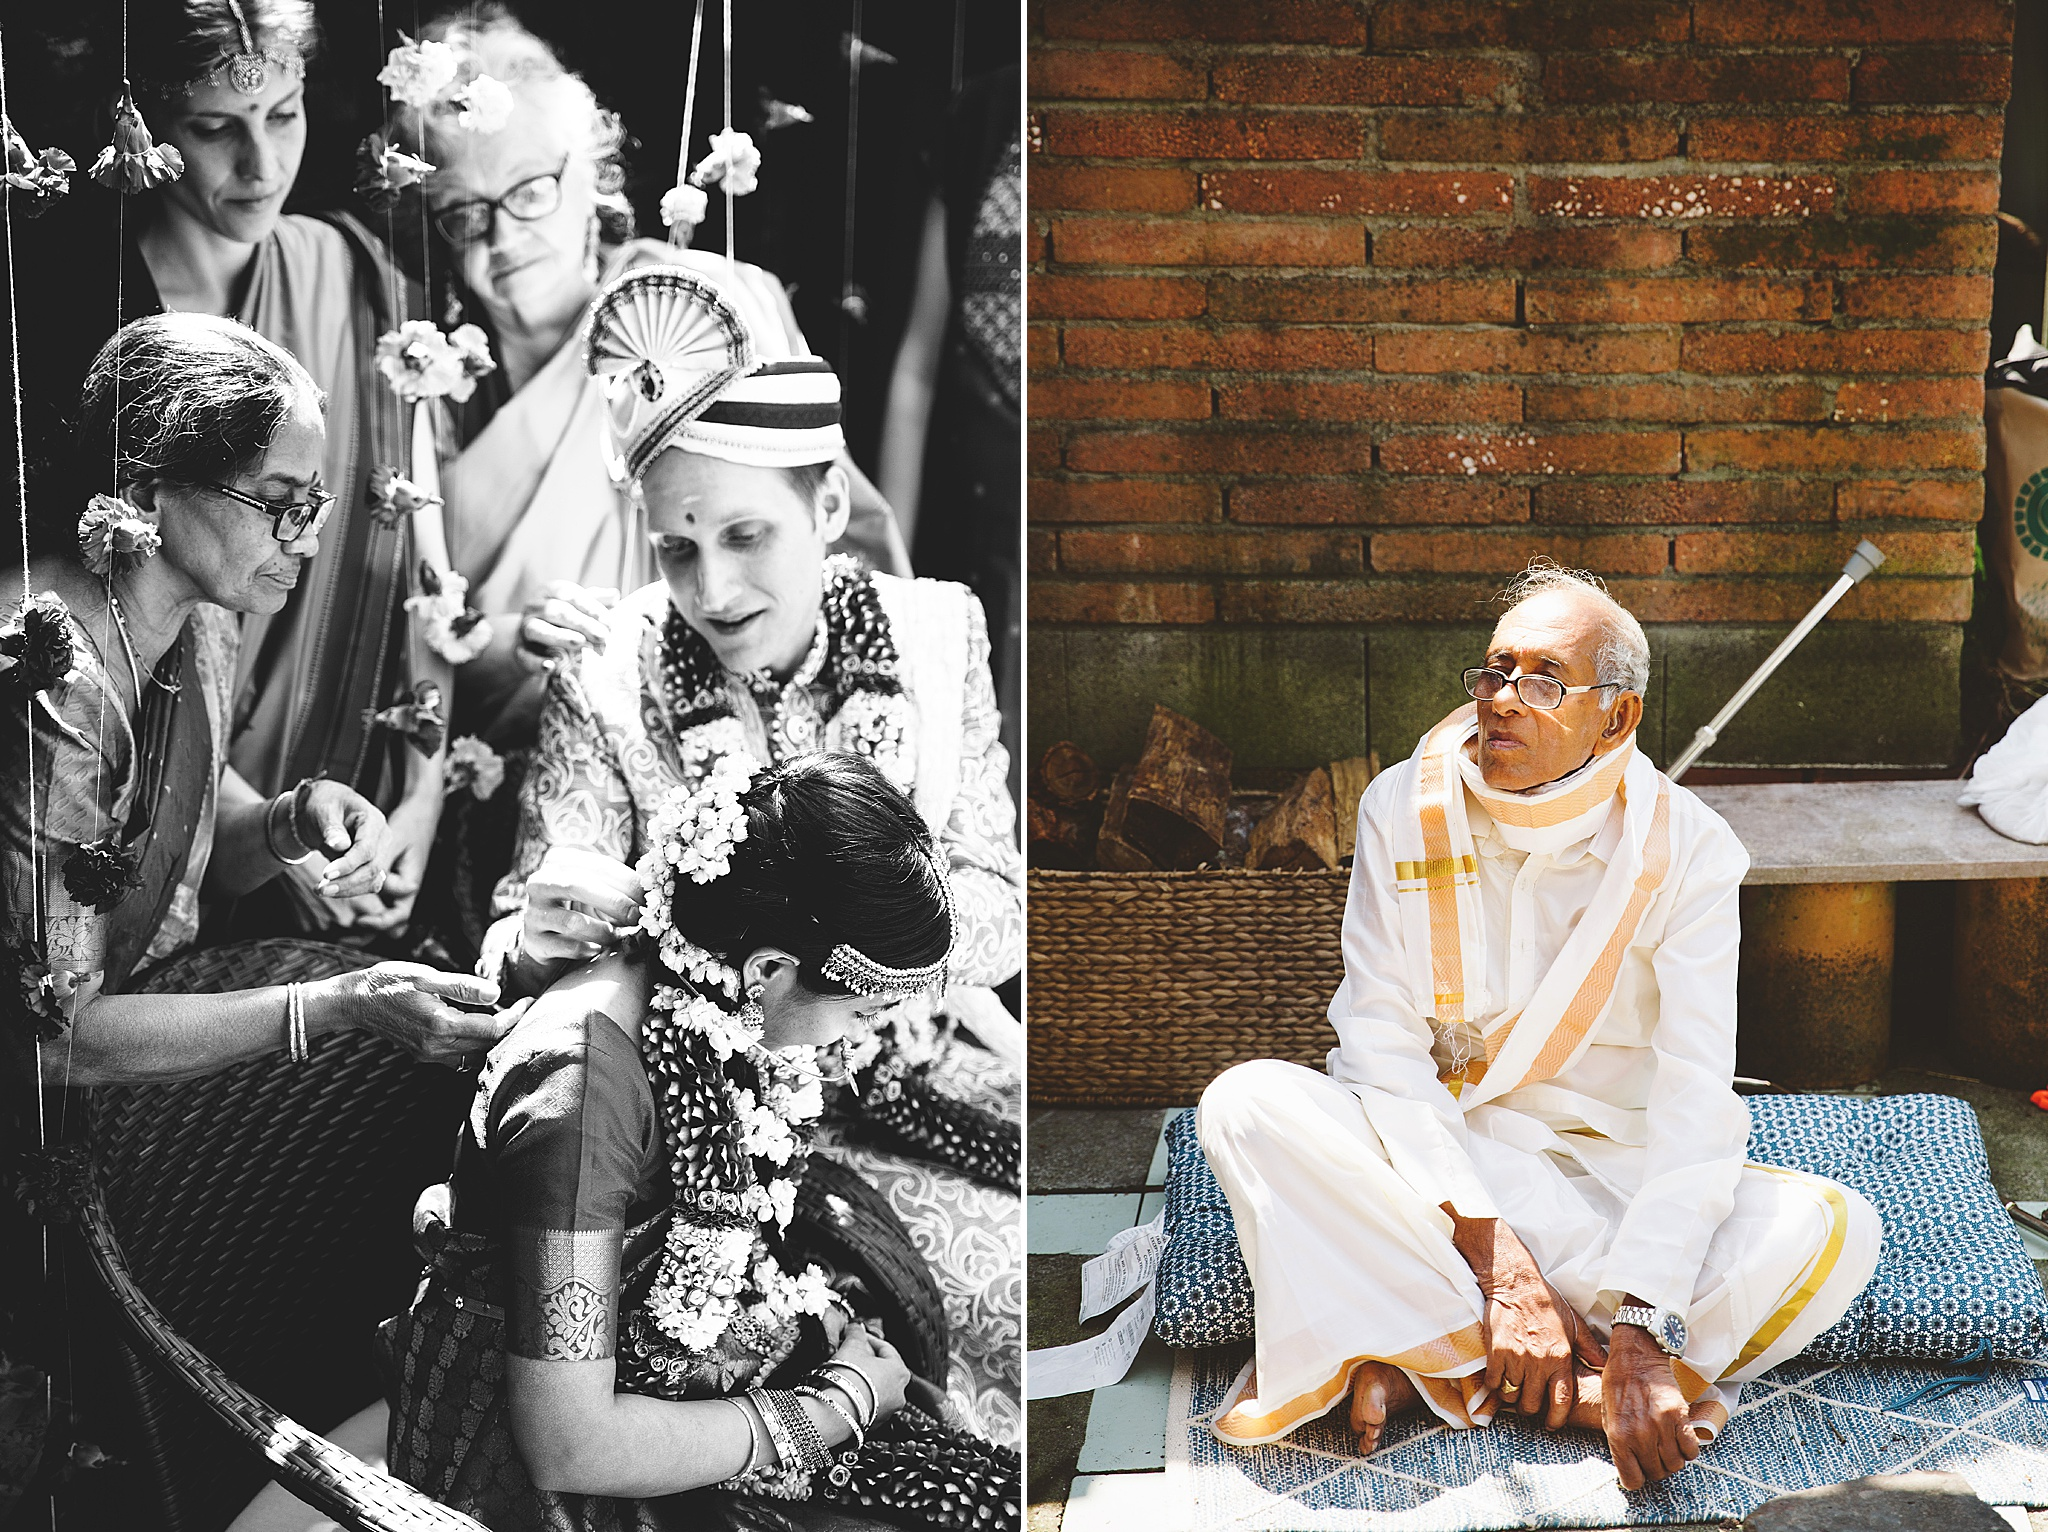 Cultural traditions at hindu wedding ceremony in los angeles.